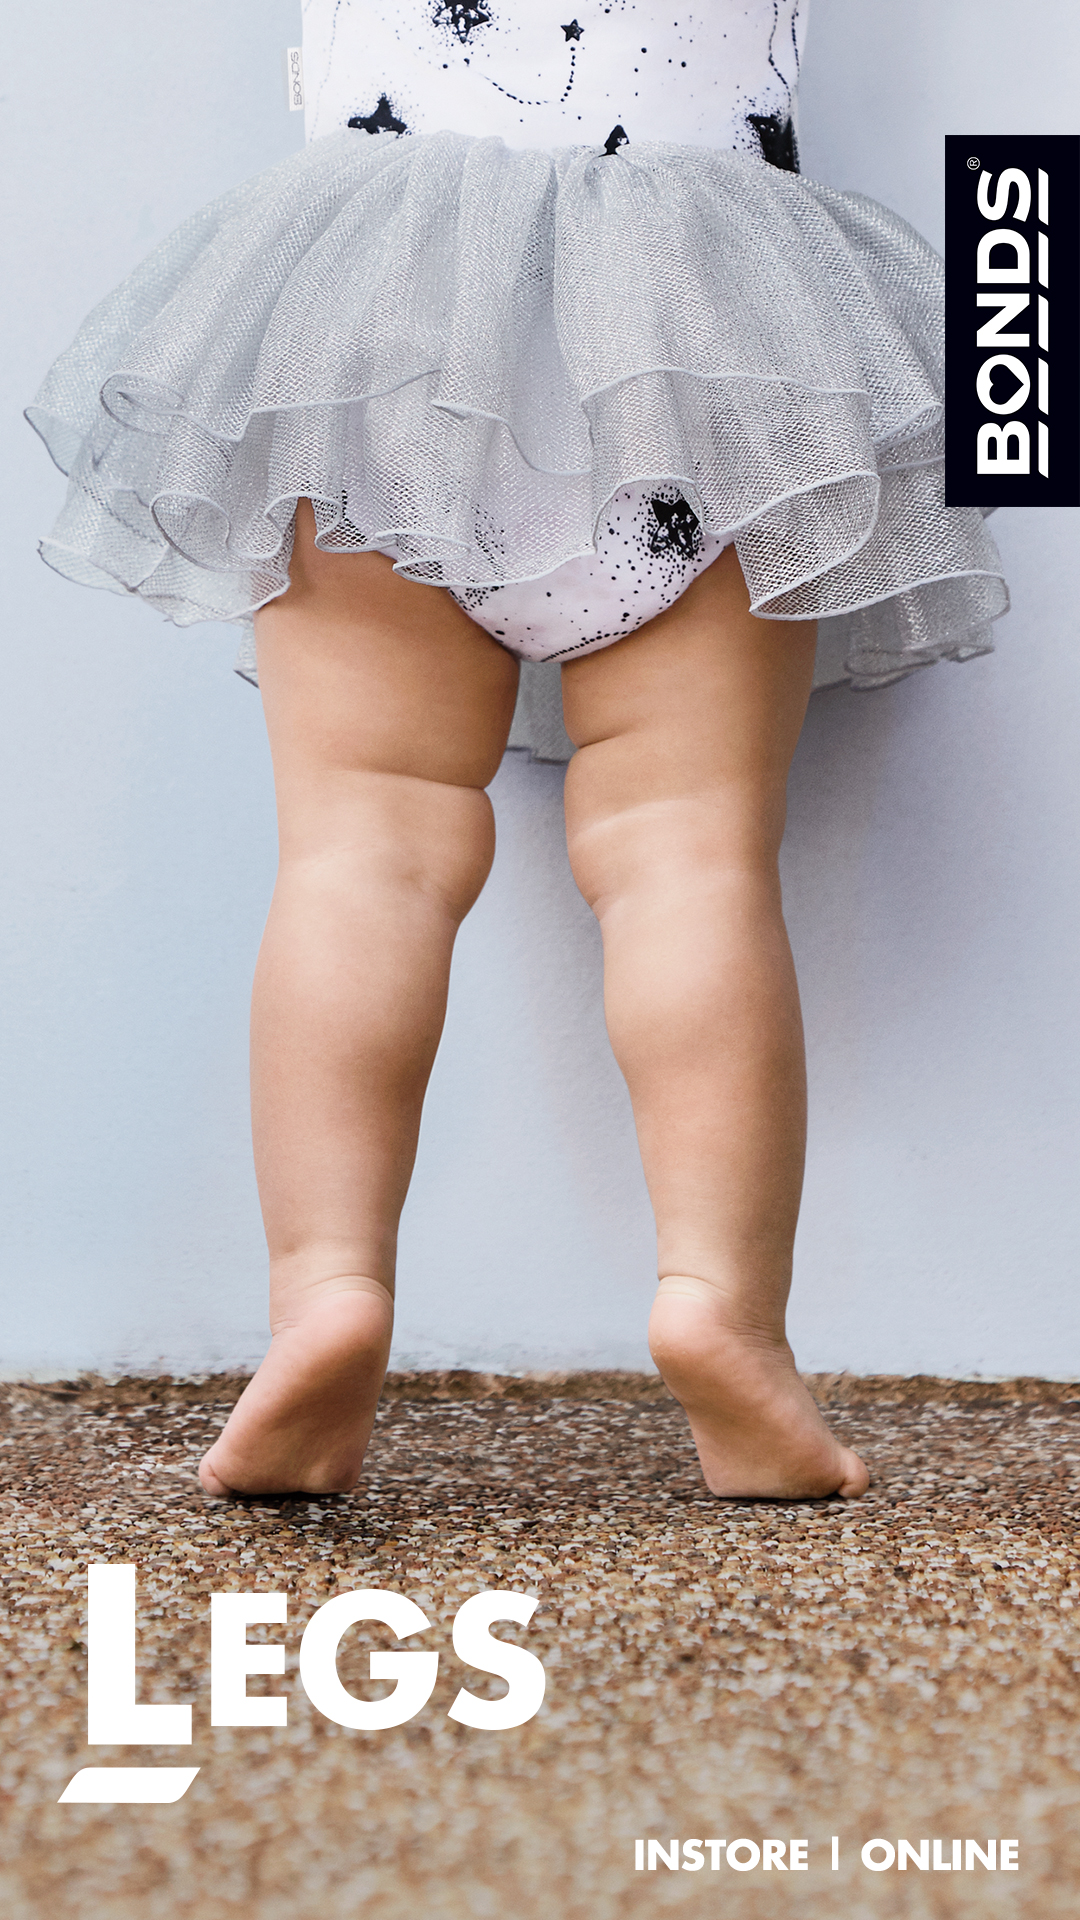 BON00068_Bonds-Summer_Ooh_Adshel_Live_1080x1920-Legs%5b4%5d